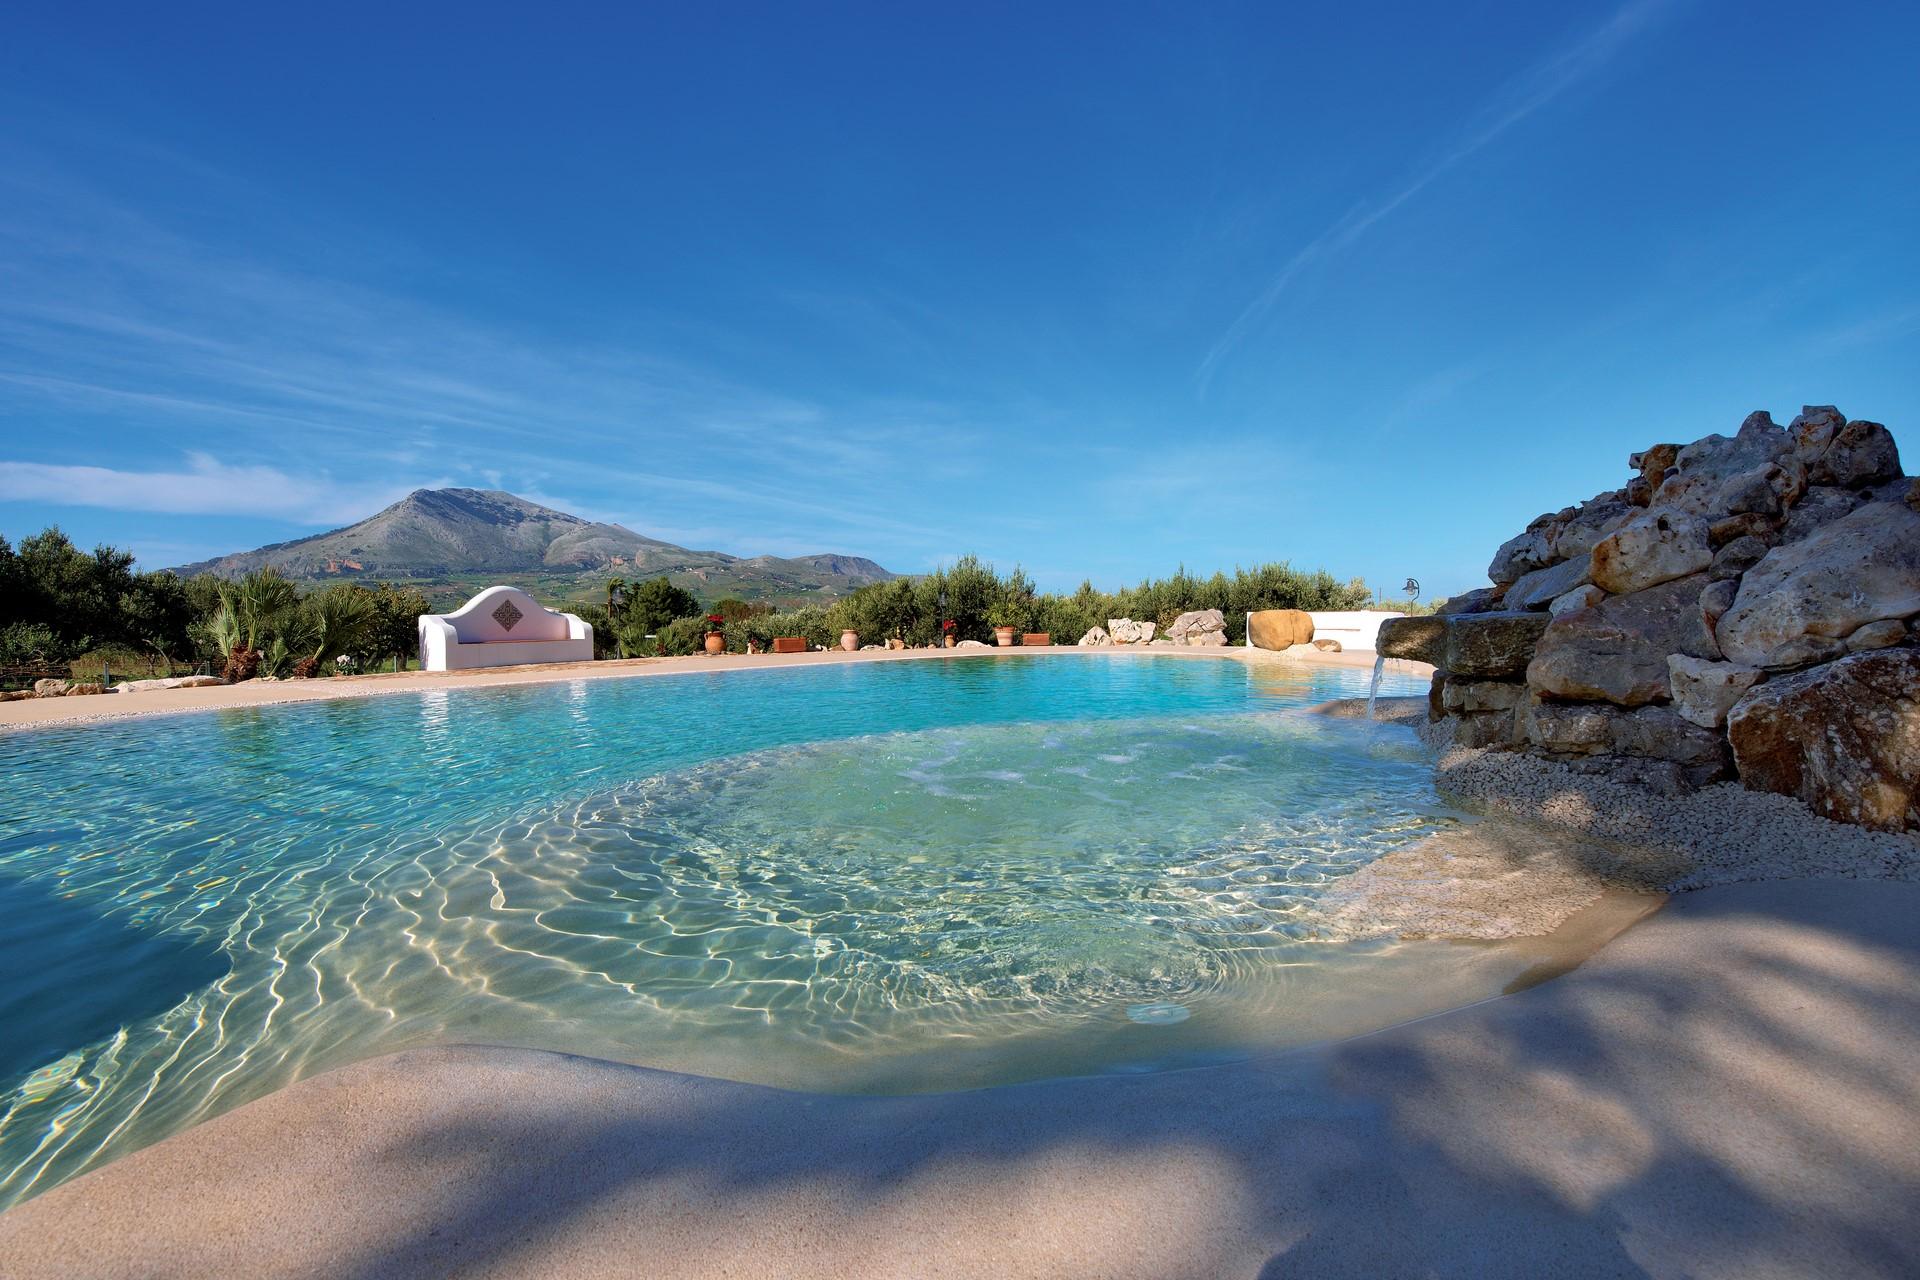 piscina-naturale-biodesign-032